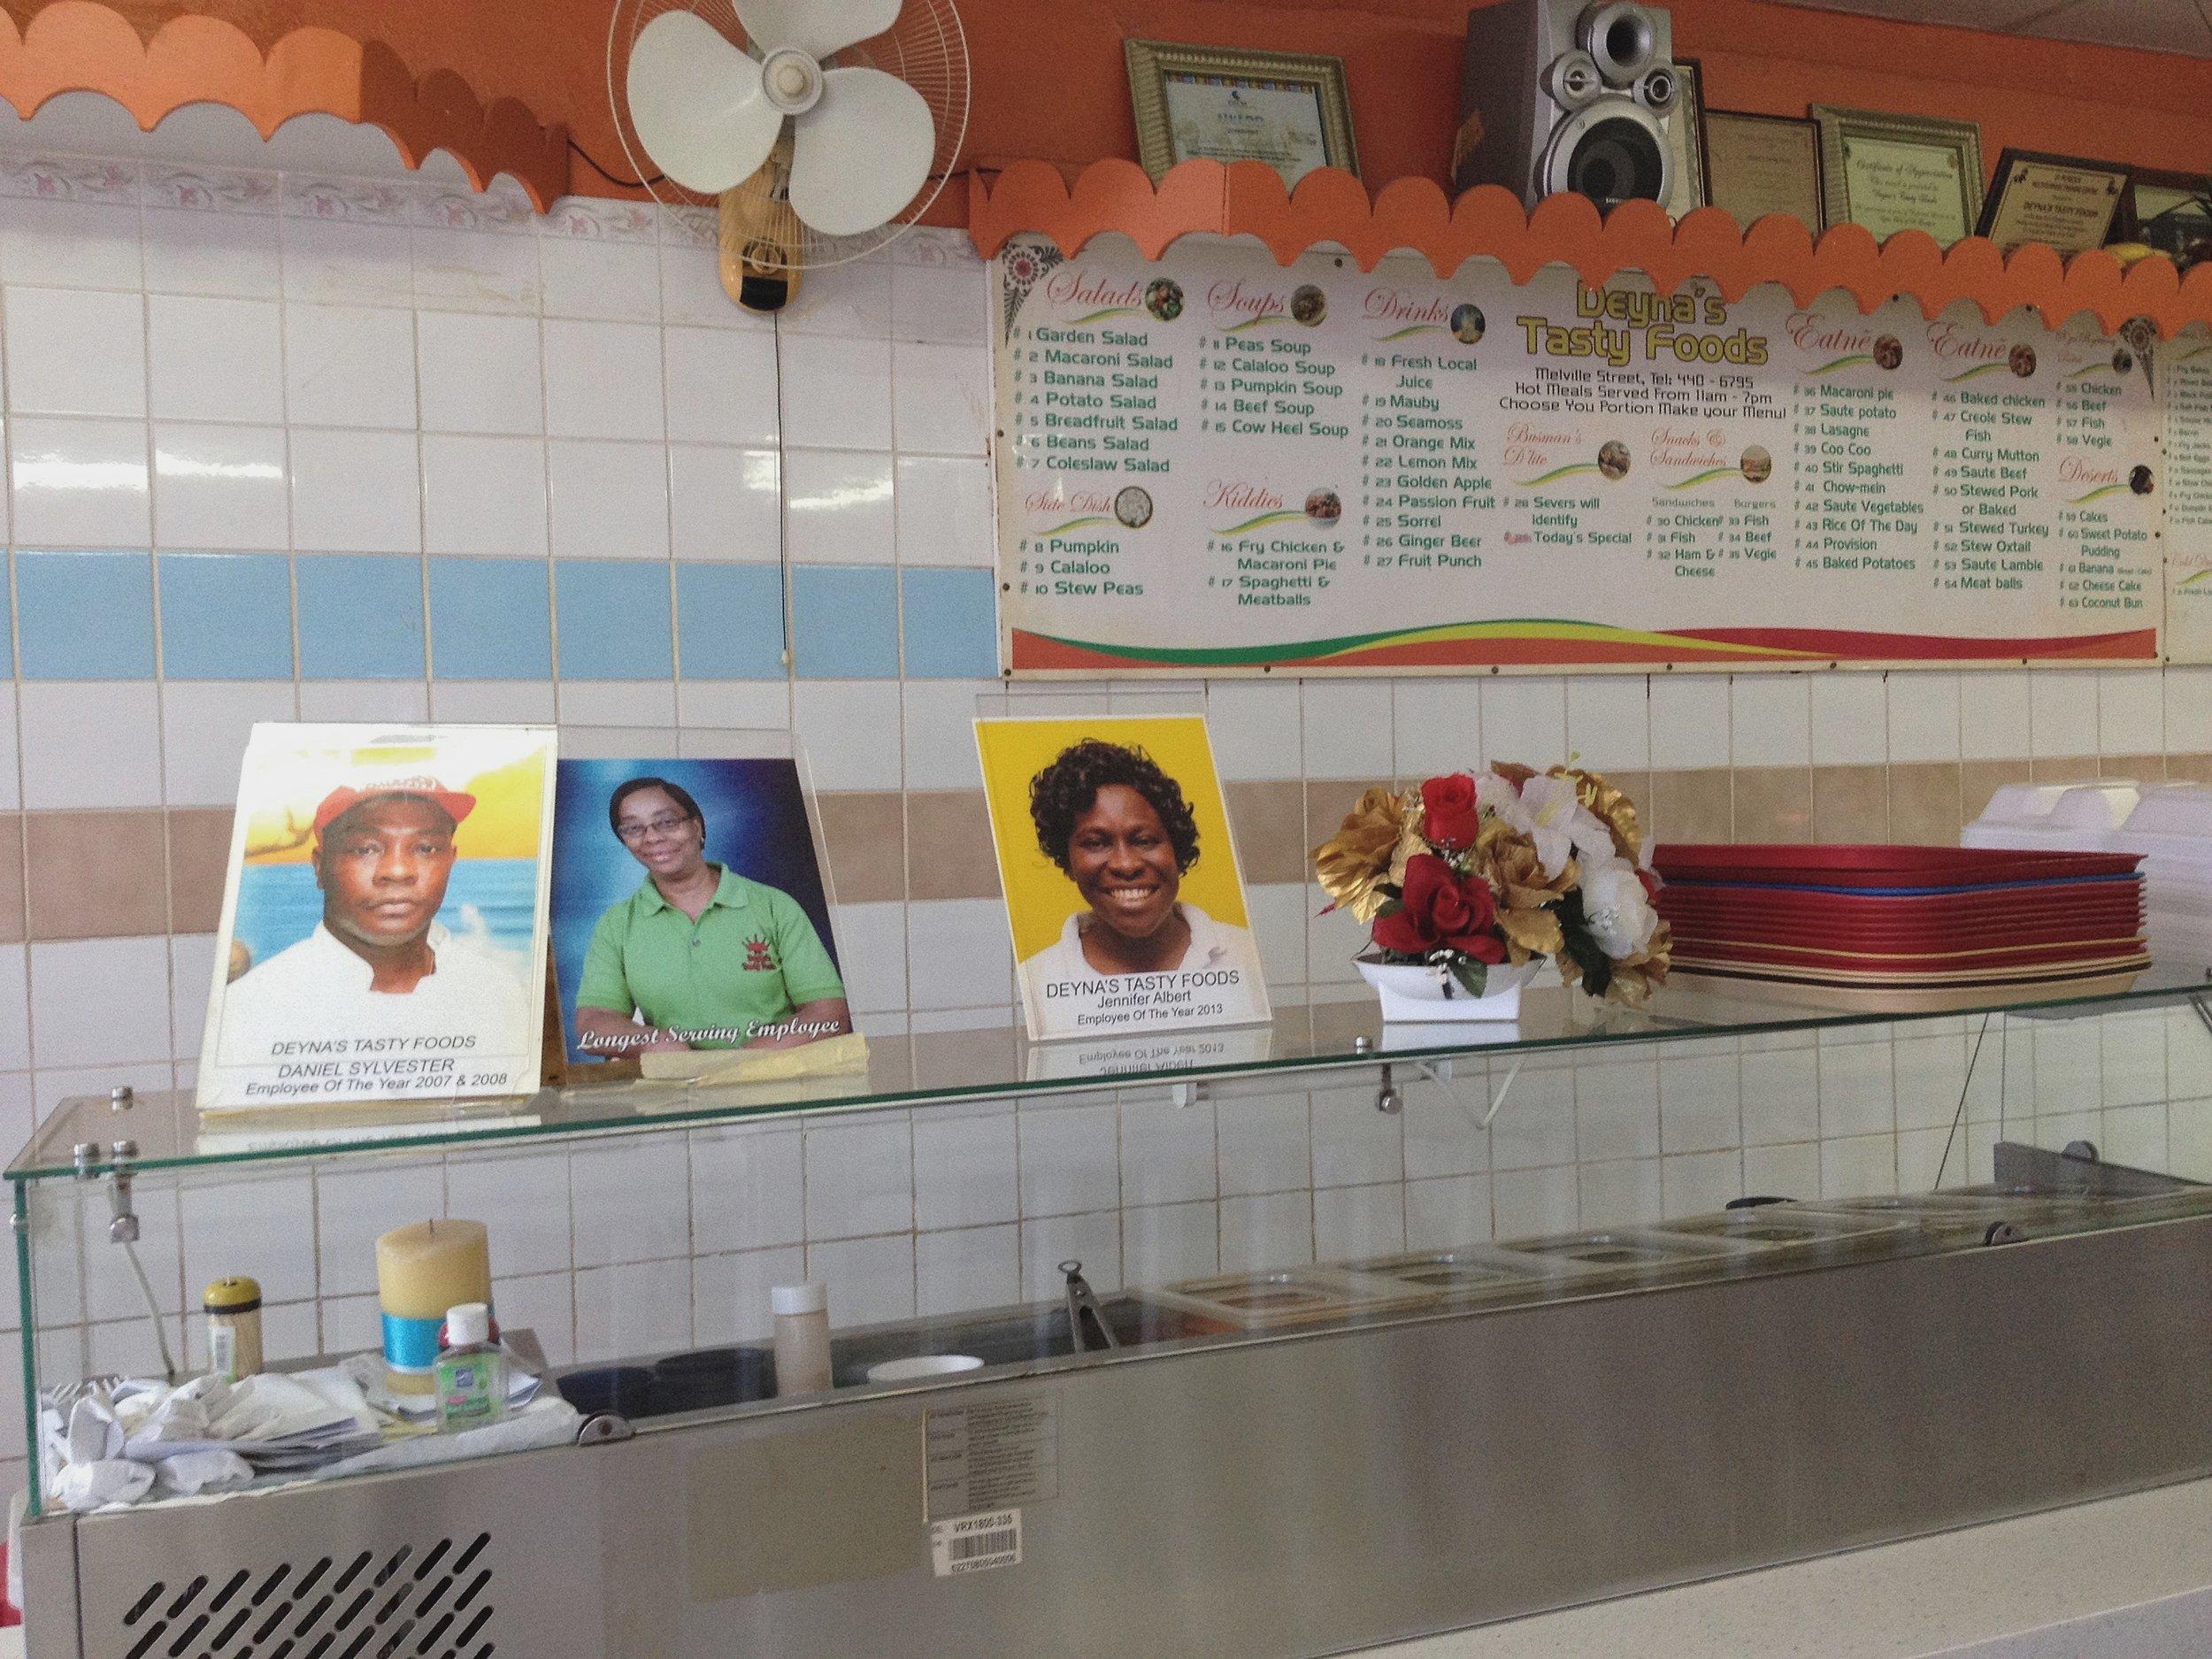 Grenada Deyna Tasty Food.jpg